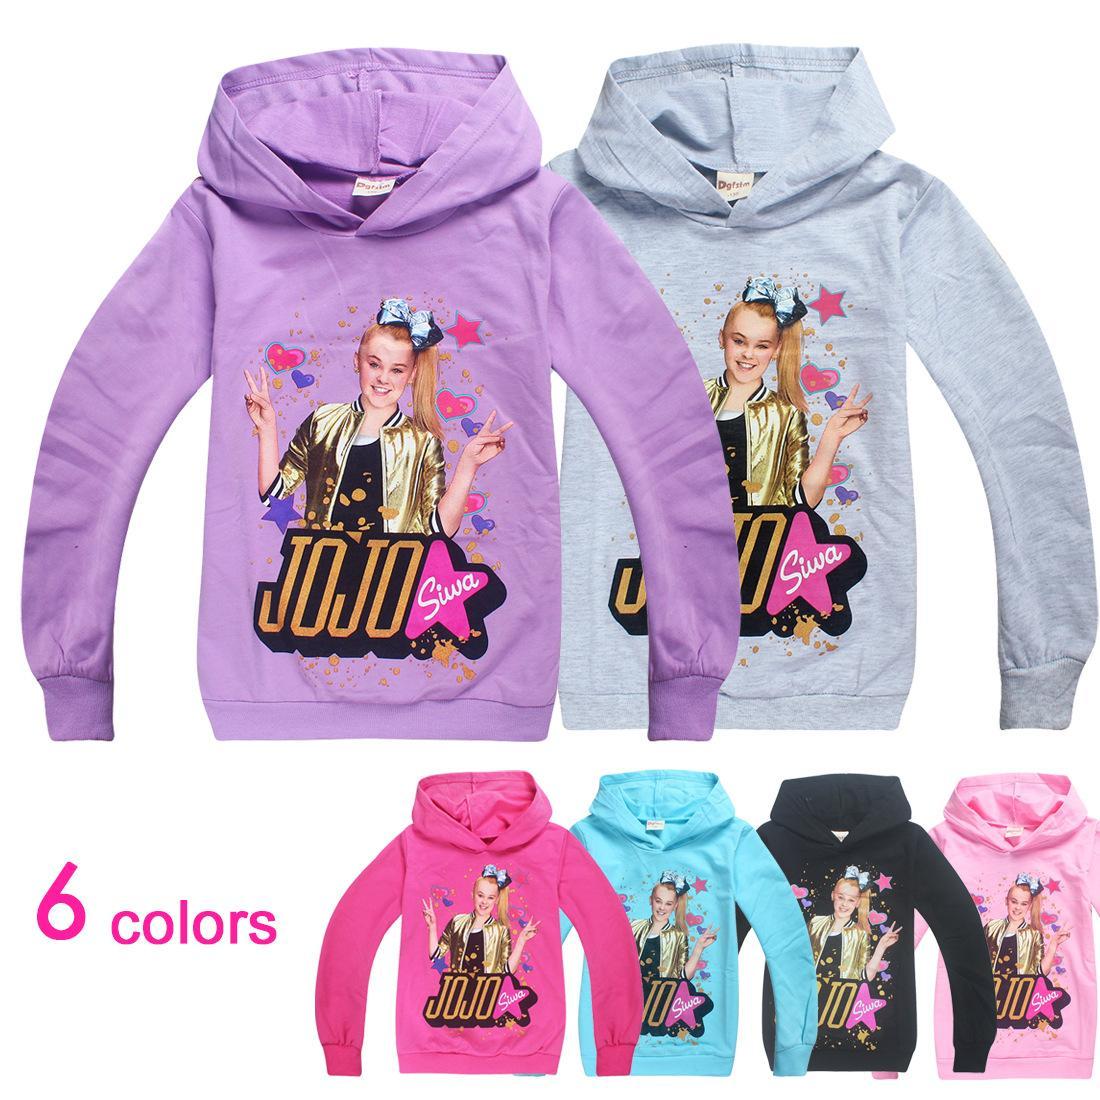 2019 Jojo Siwa Hoodie Bebek Kız Çocuk T-shirt Kazak Hoodies ceket Çocuk Sonbahar Bahar Kış Kazak Kazak Genç eşofman tee